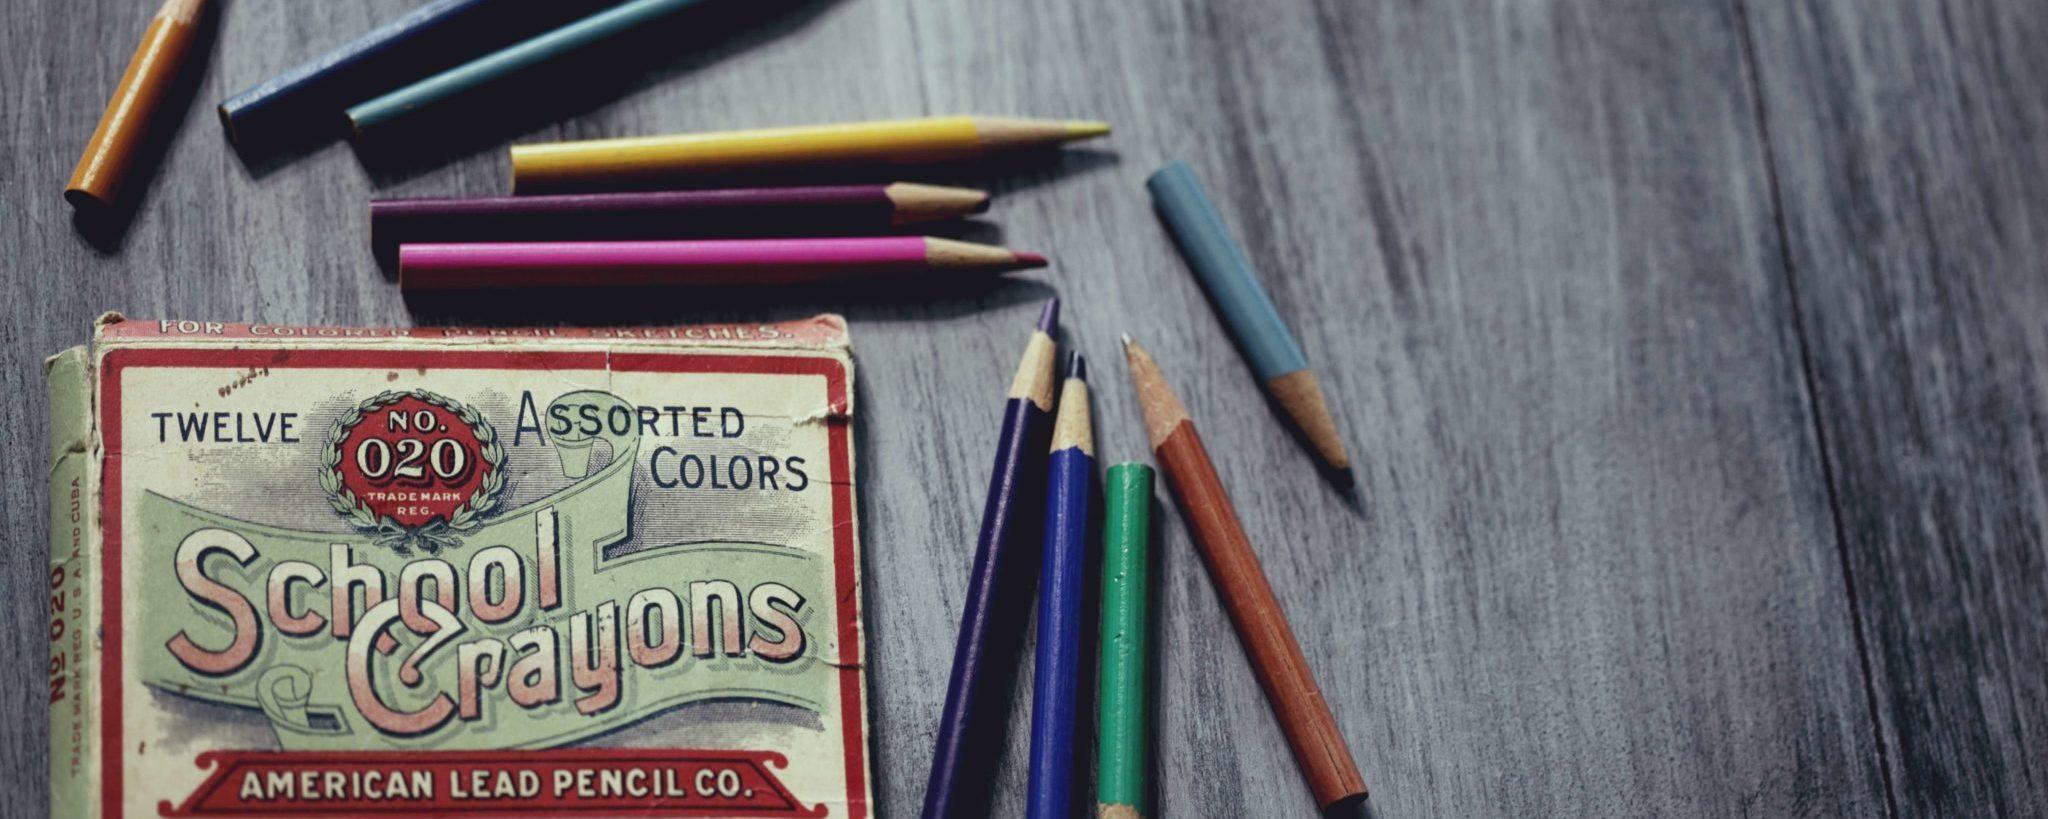 24/7 Education Group: Brand Ambassadors